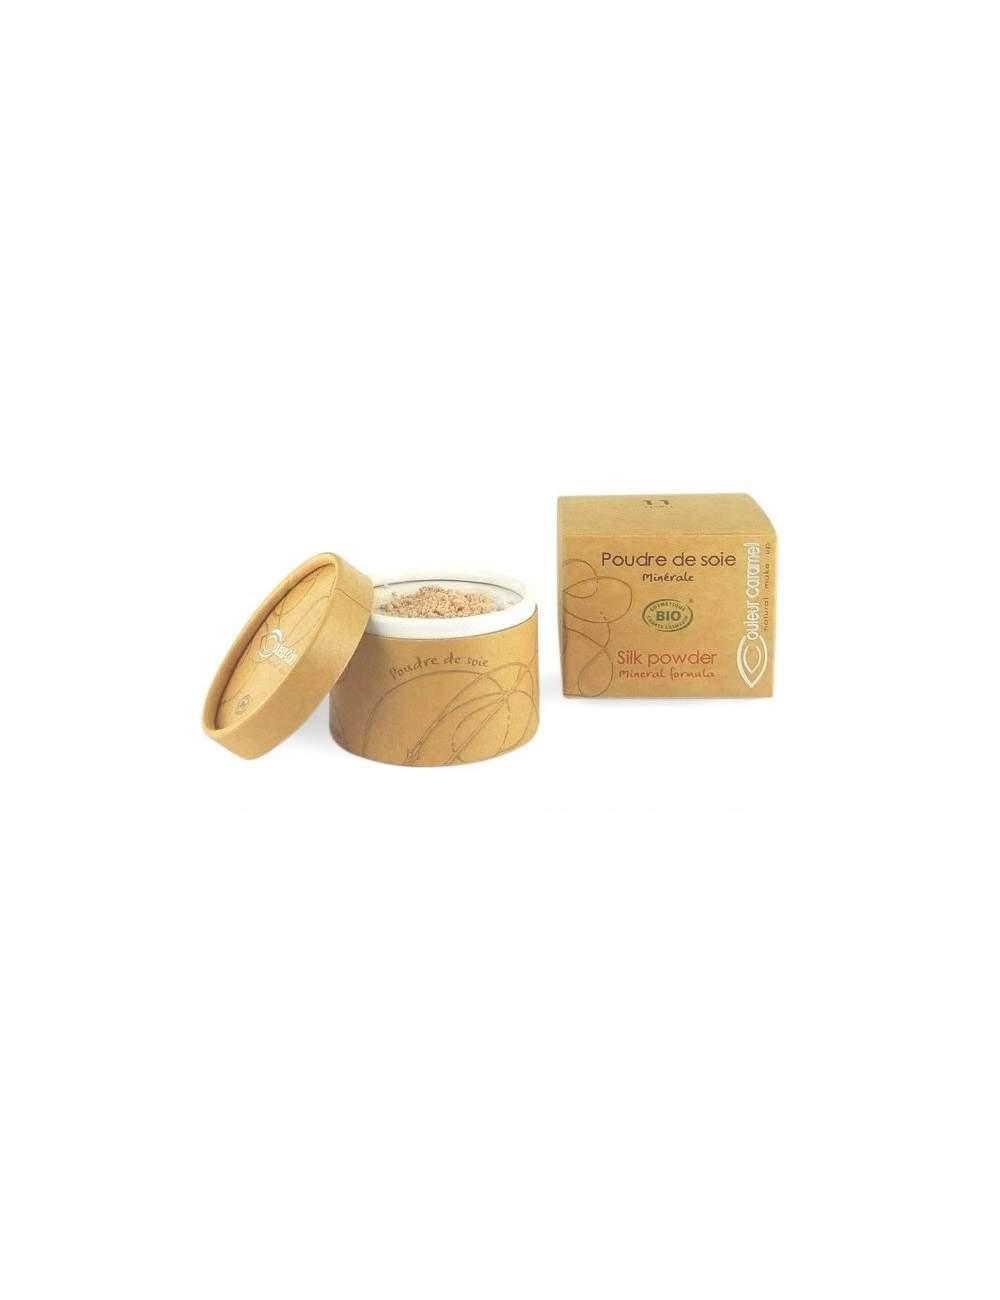 Polvos de Seda Bio. Couleur Caramel